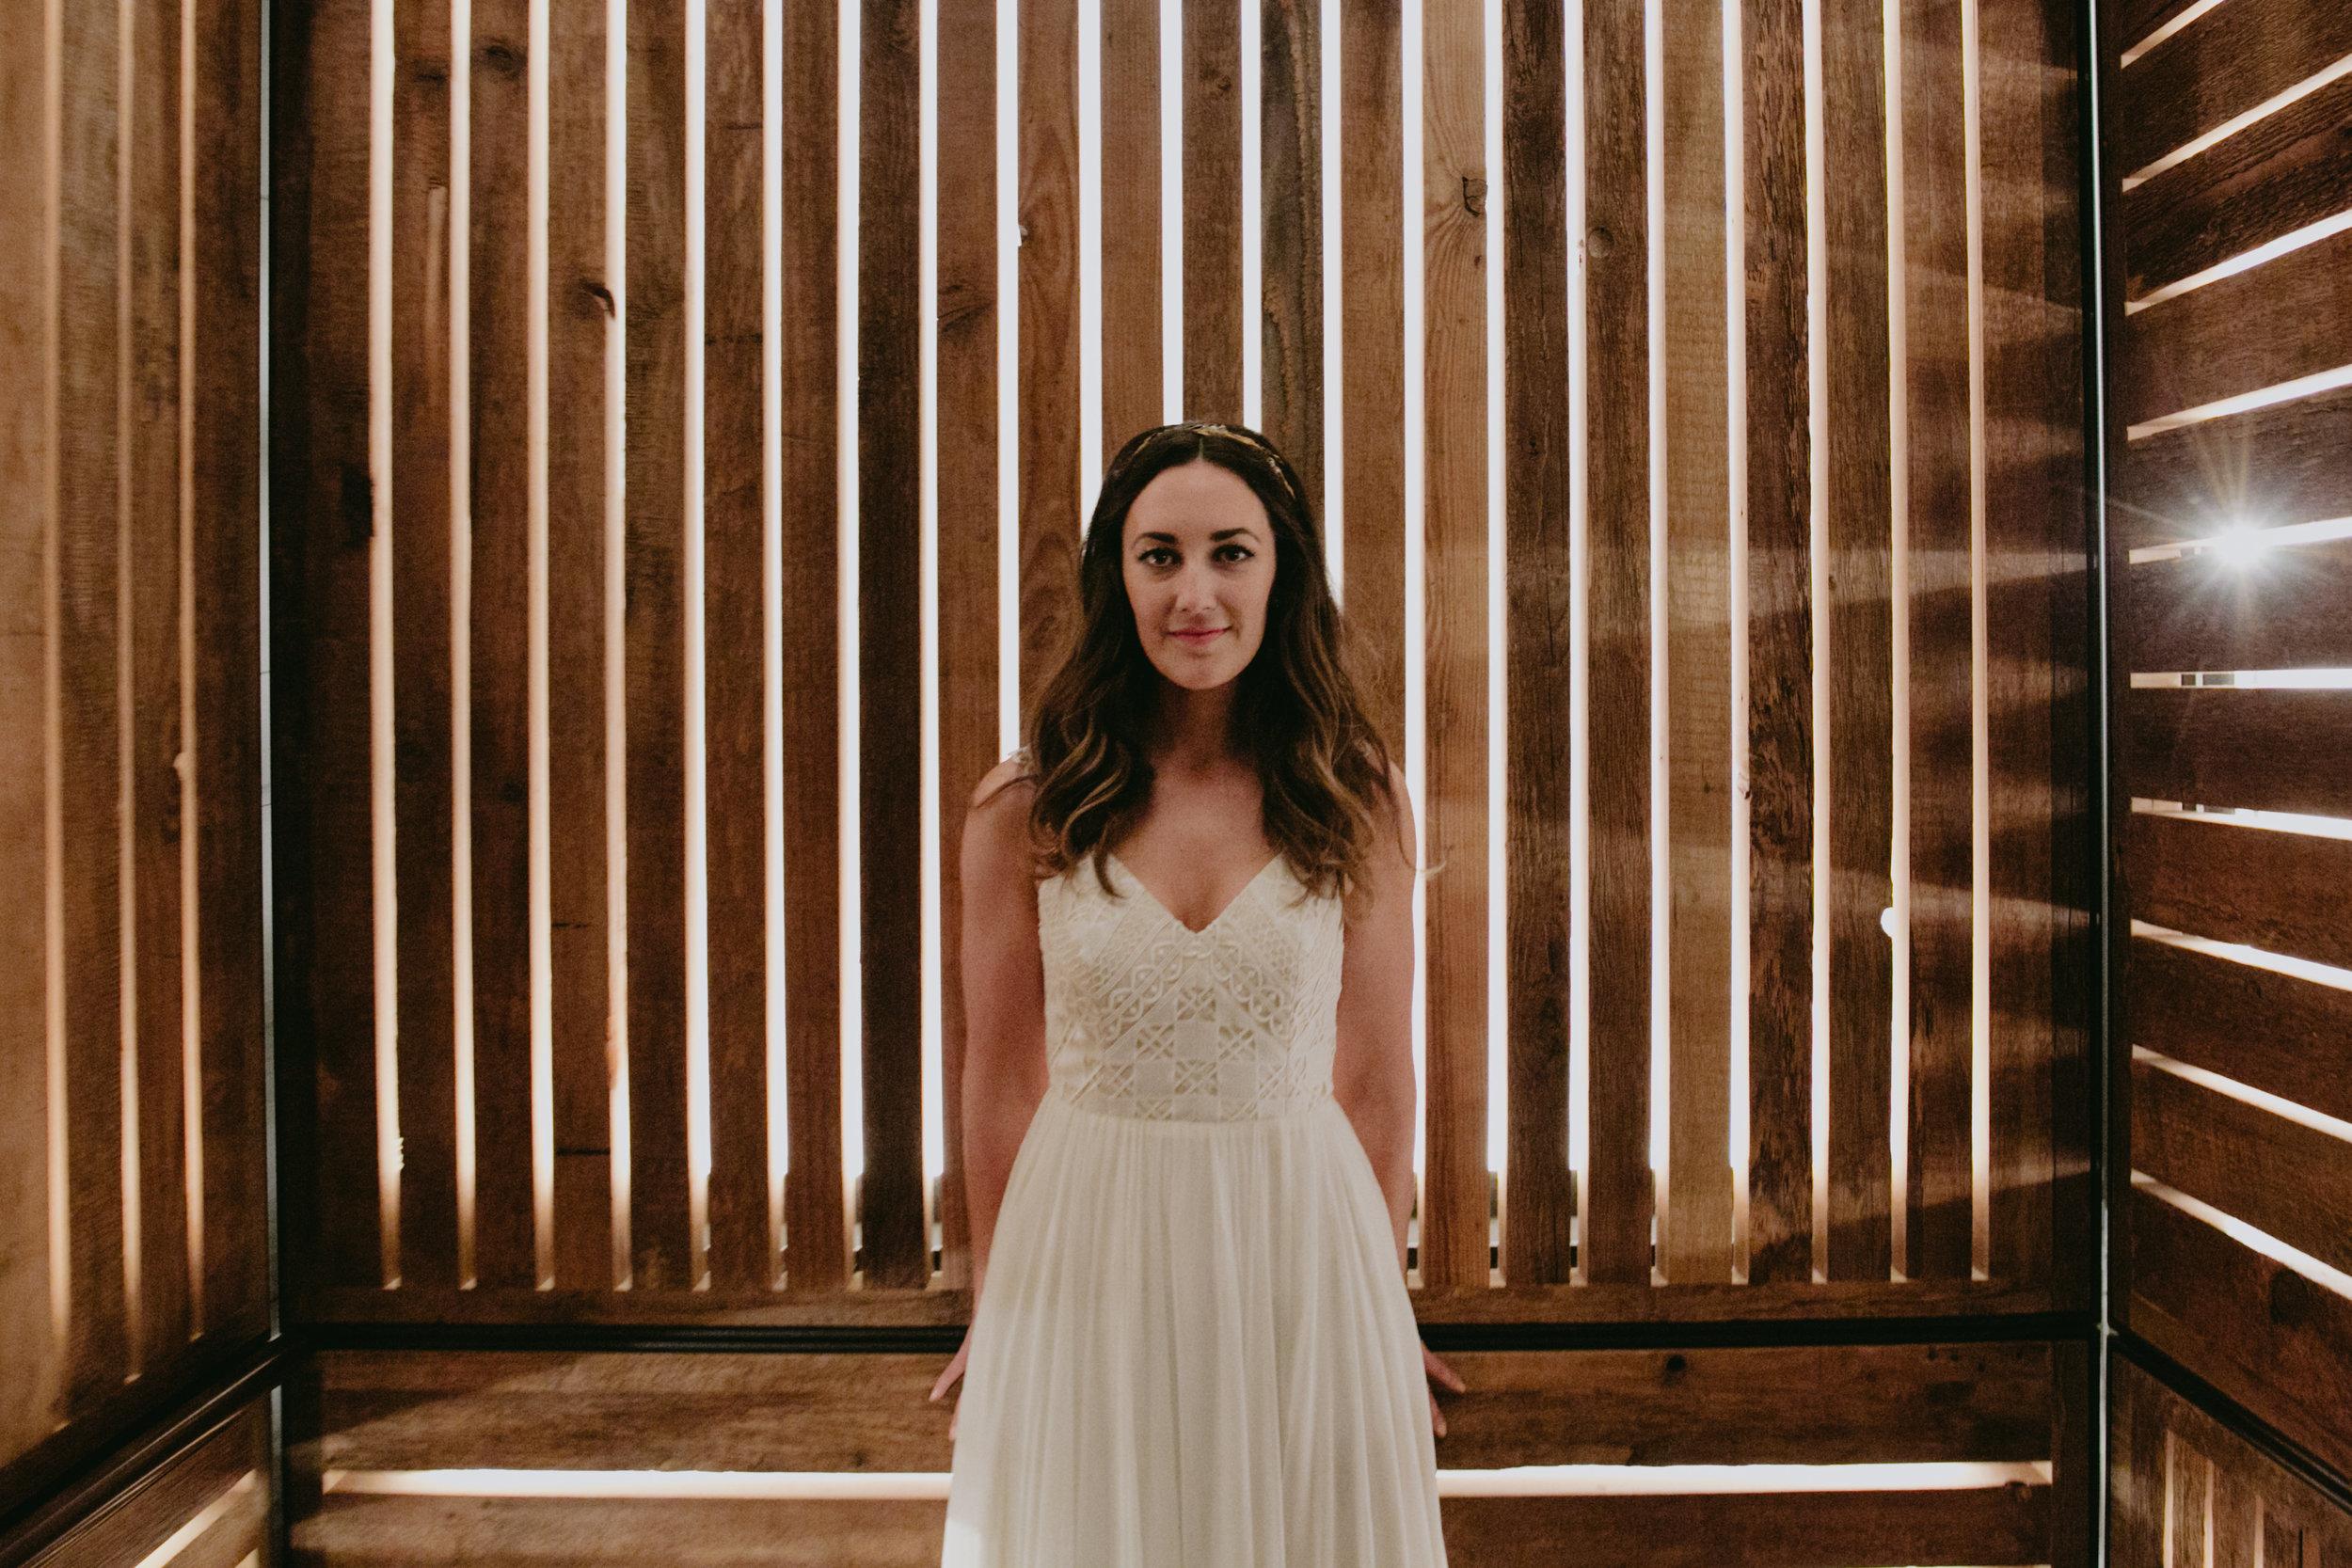 501Union_Brooklyn_Wedding_Photographer_Chellise_Michael_Photography-188.jpg